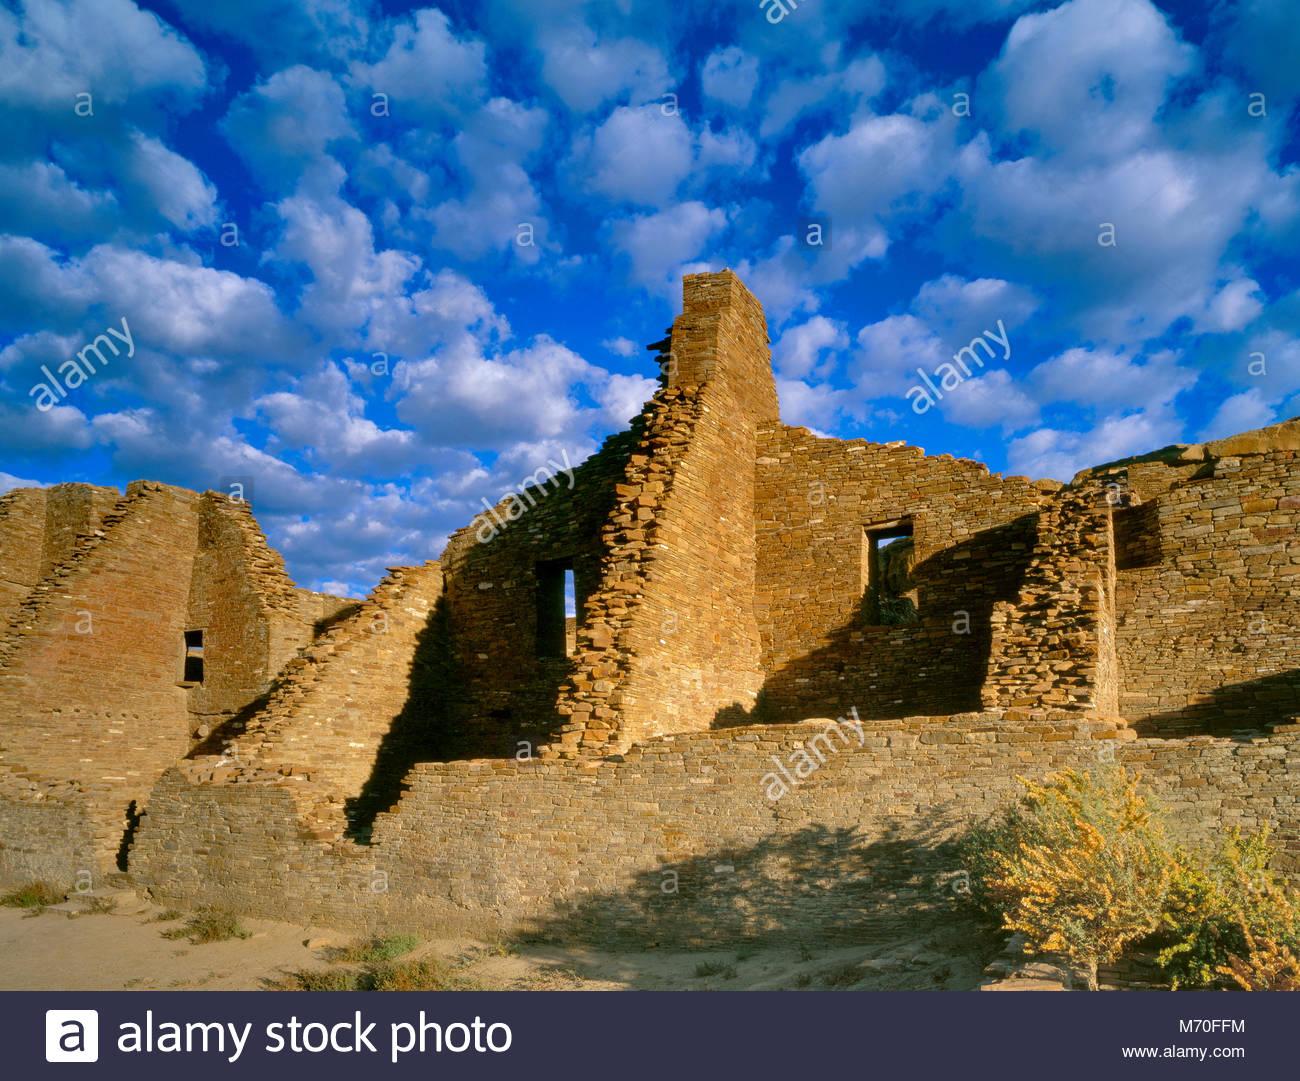 Ruins, Pueblo Bonito, Chaco Culture National Historical Park, New Mexico - Stock Image